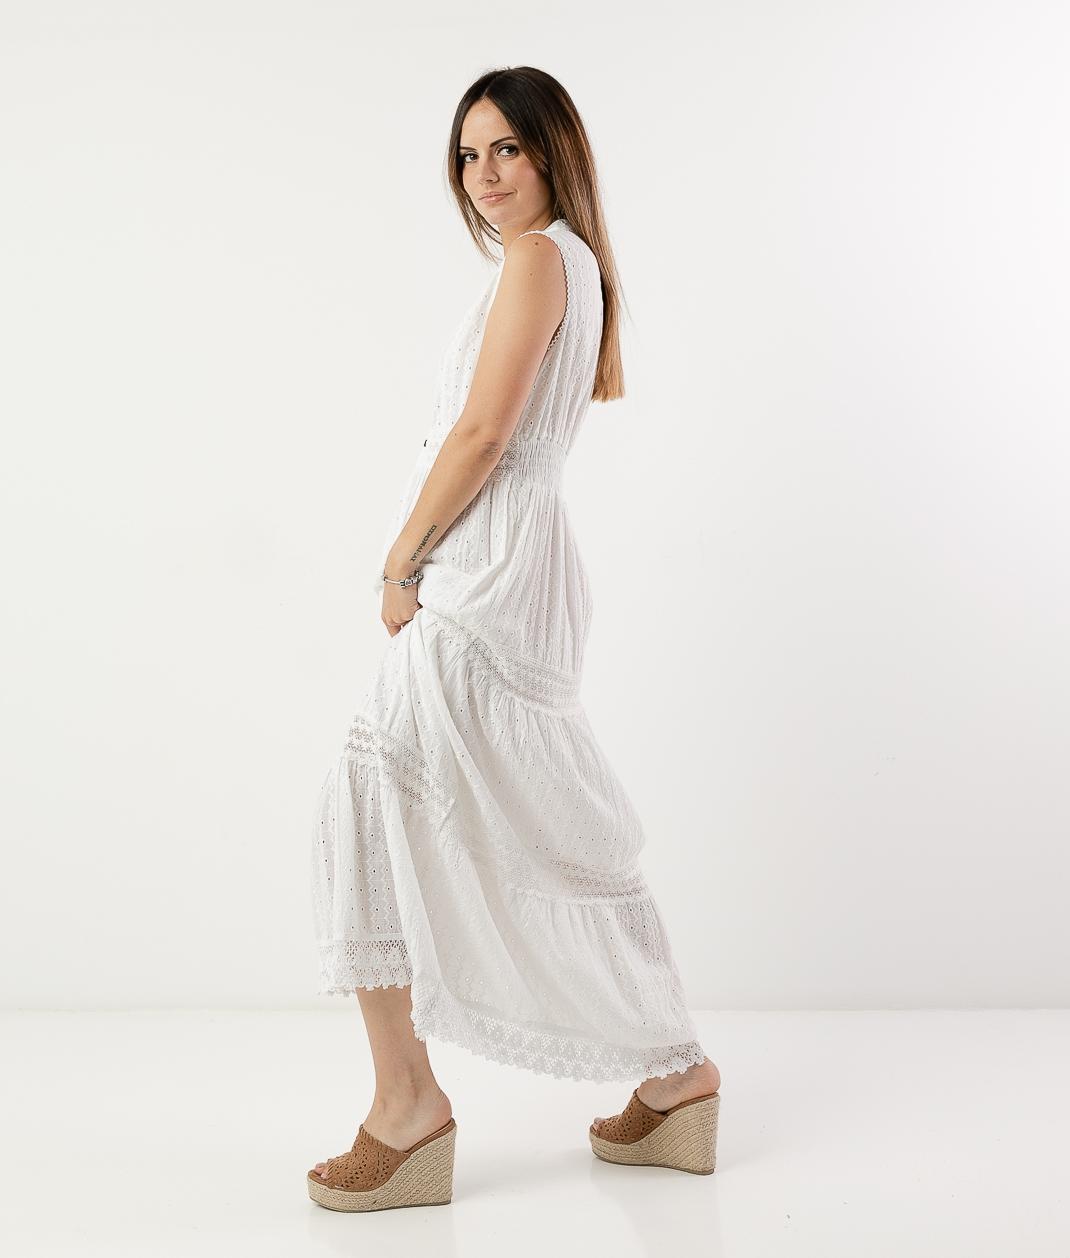 DAIRE DRESS - WHITE